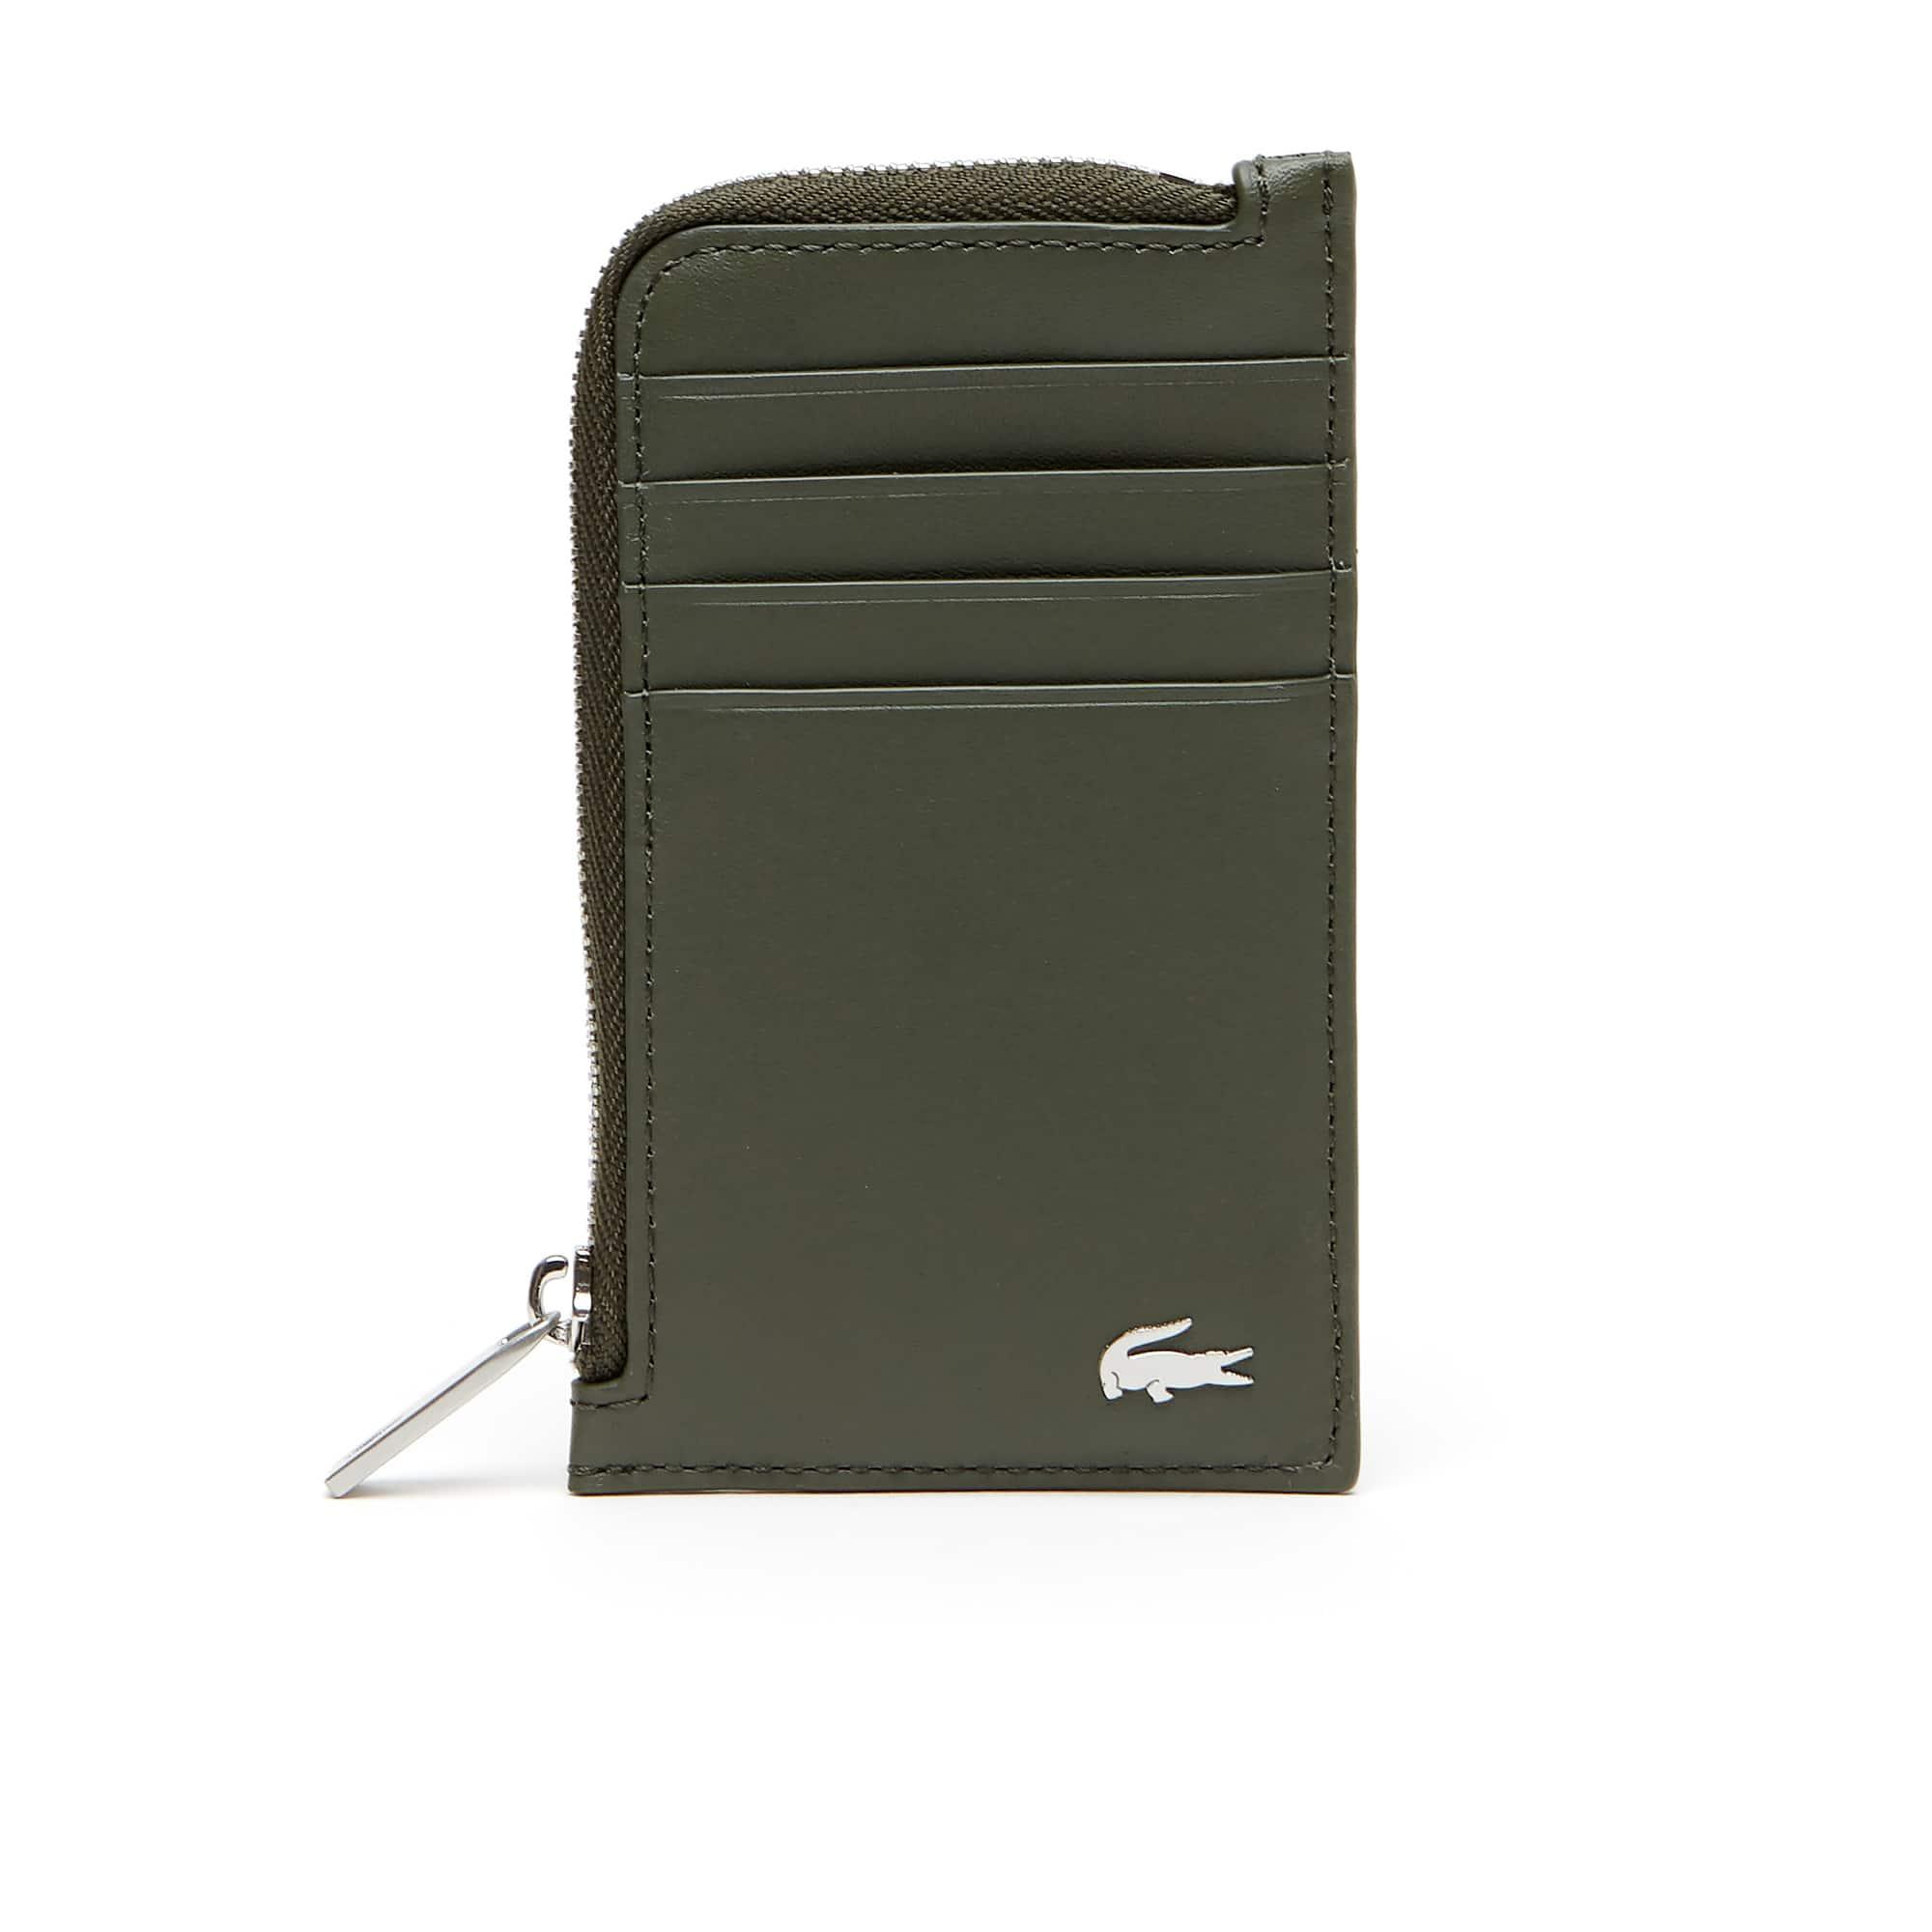 Men's FG Leather Zip Card Holder